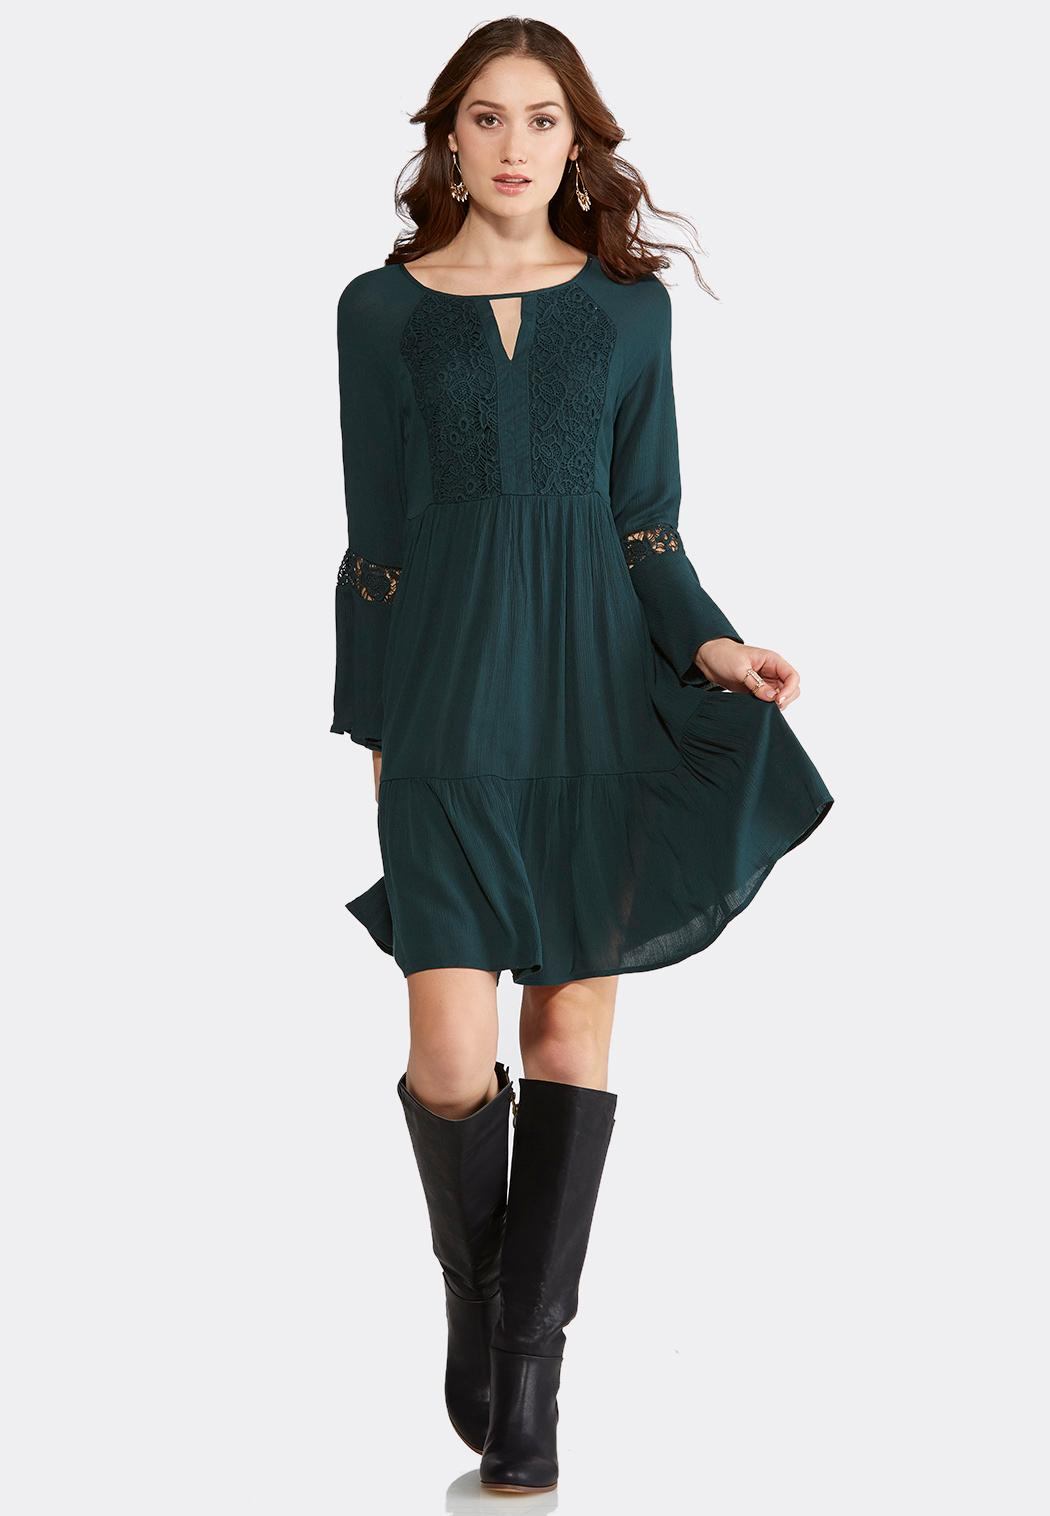 Plus Size Gauzy Lace Peasant Dress A-line & Swing Cato